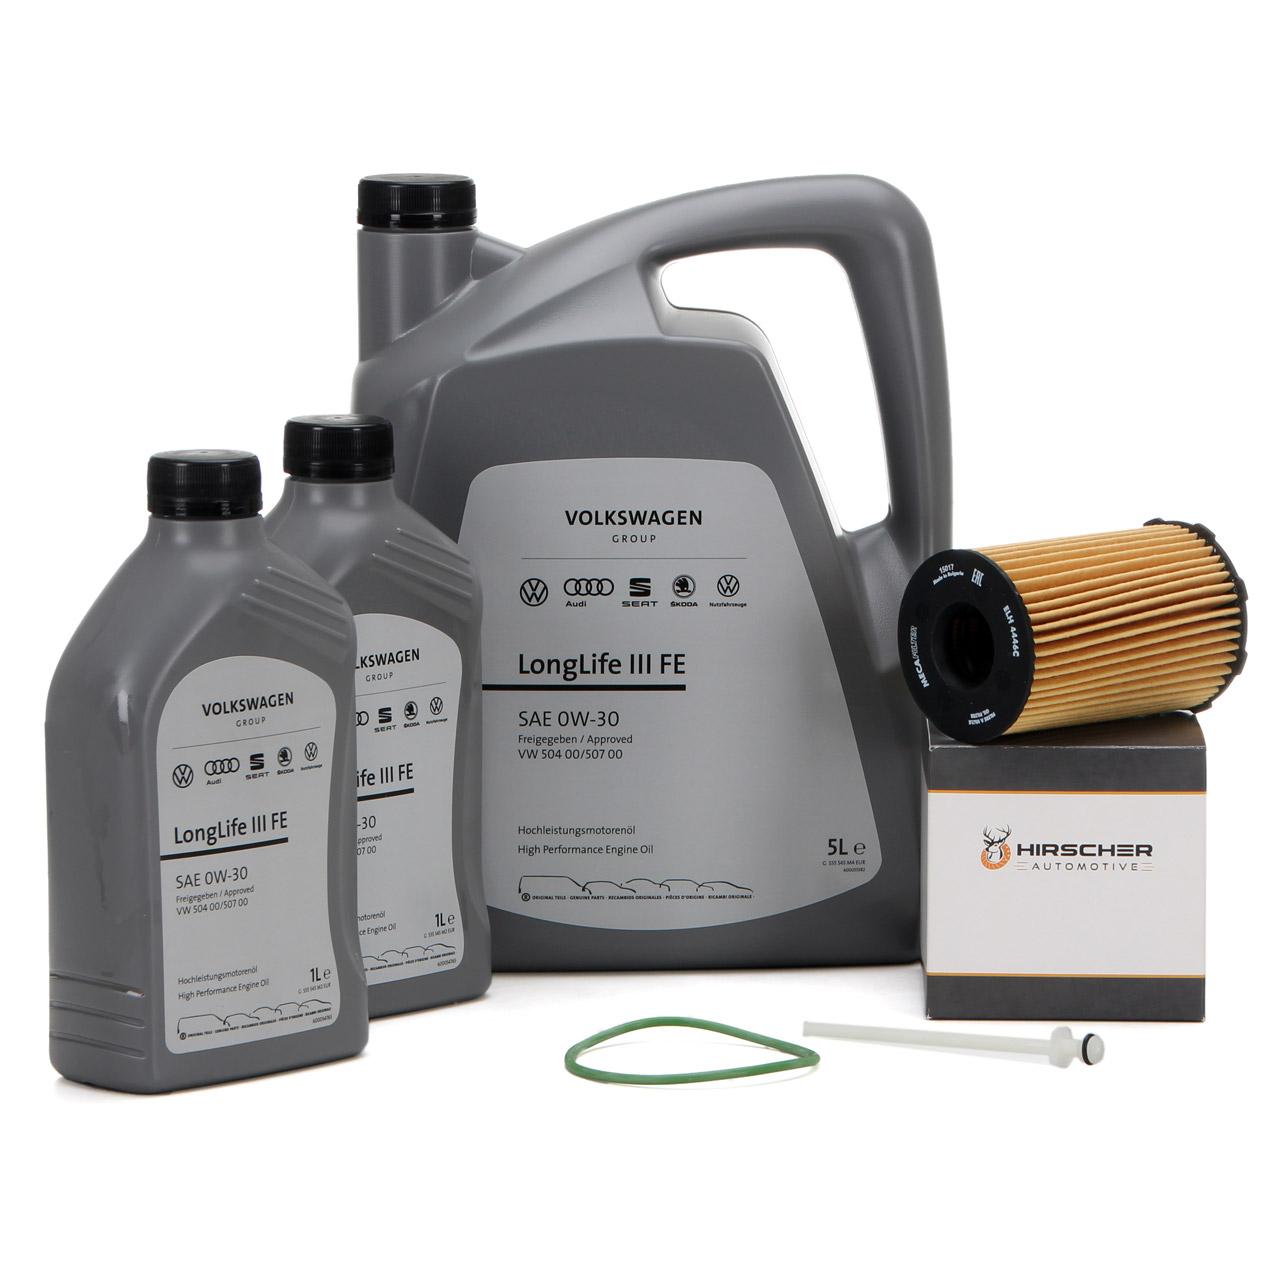 ORIGINAL VW Motoröl Öl 0W30 LONGLIFE III FE 7 L + HIRSCHER Ölfilter 059198405